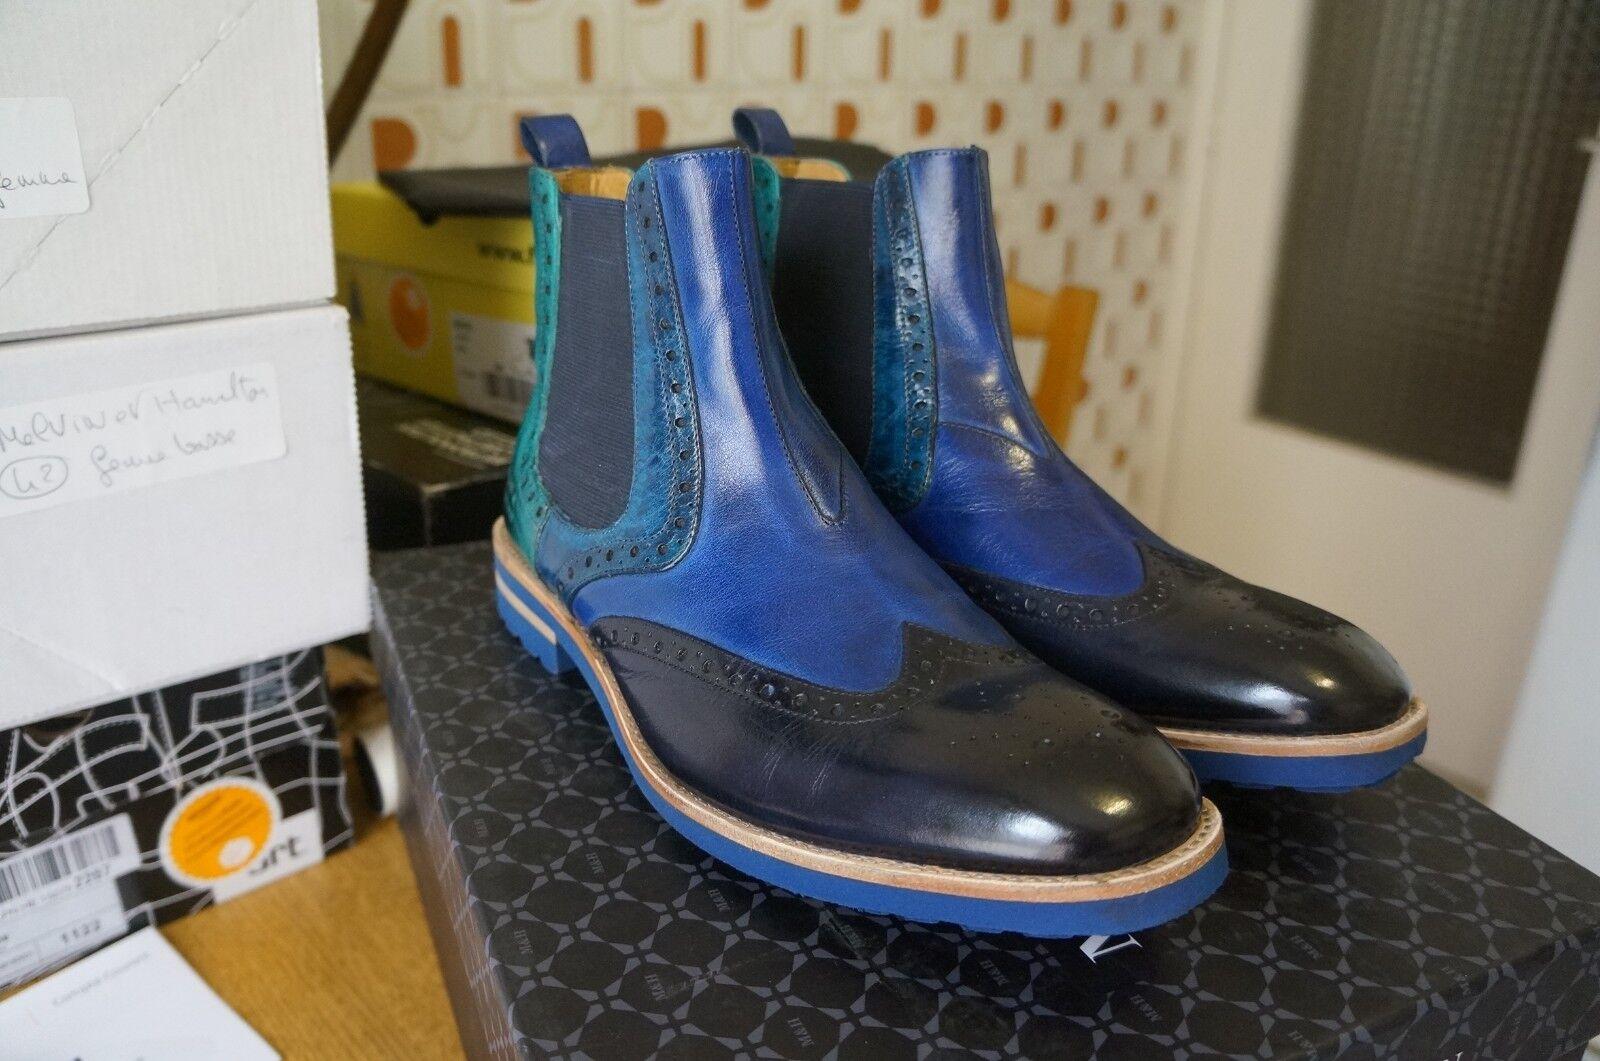 Melvin & HamiltonEddy 13 13 13 - botas Chelsea hombres, azul 41 EU 120b11